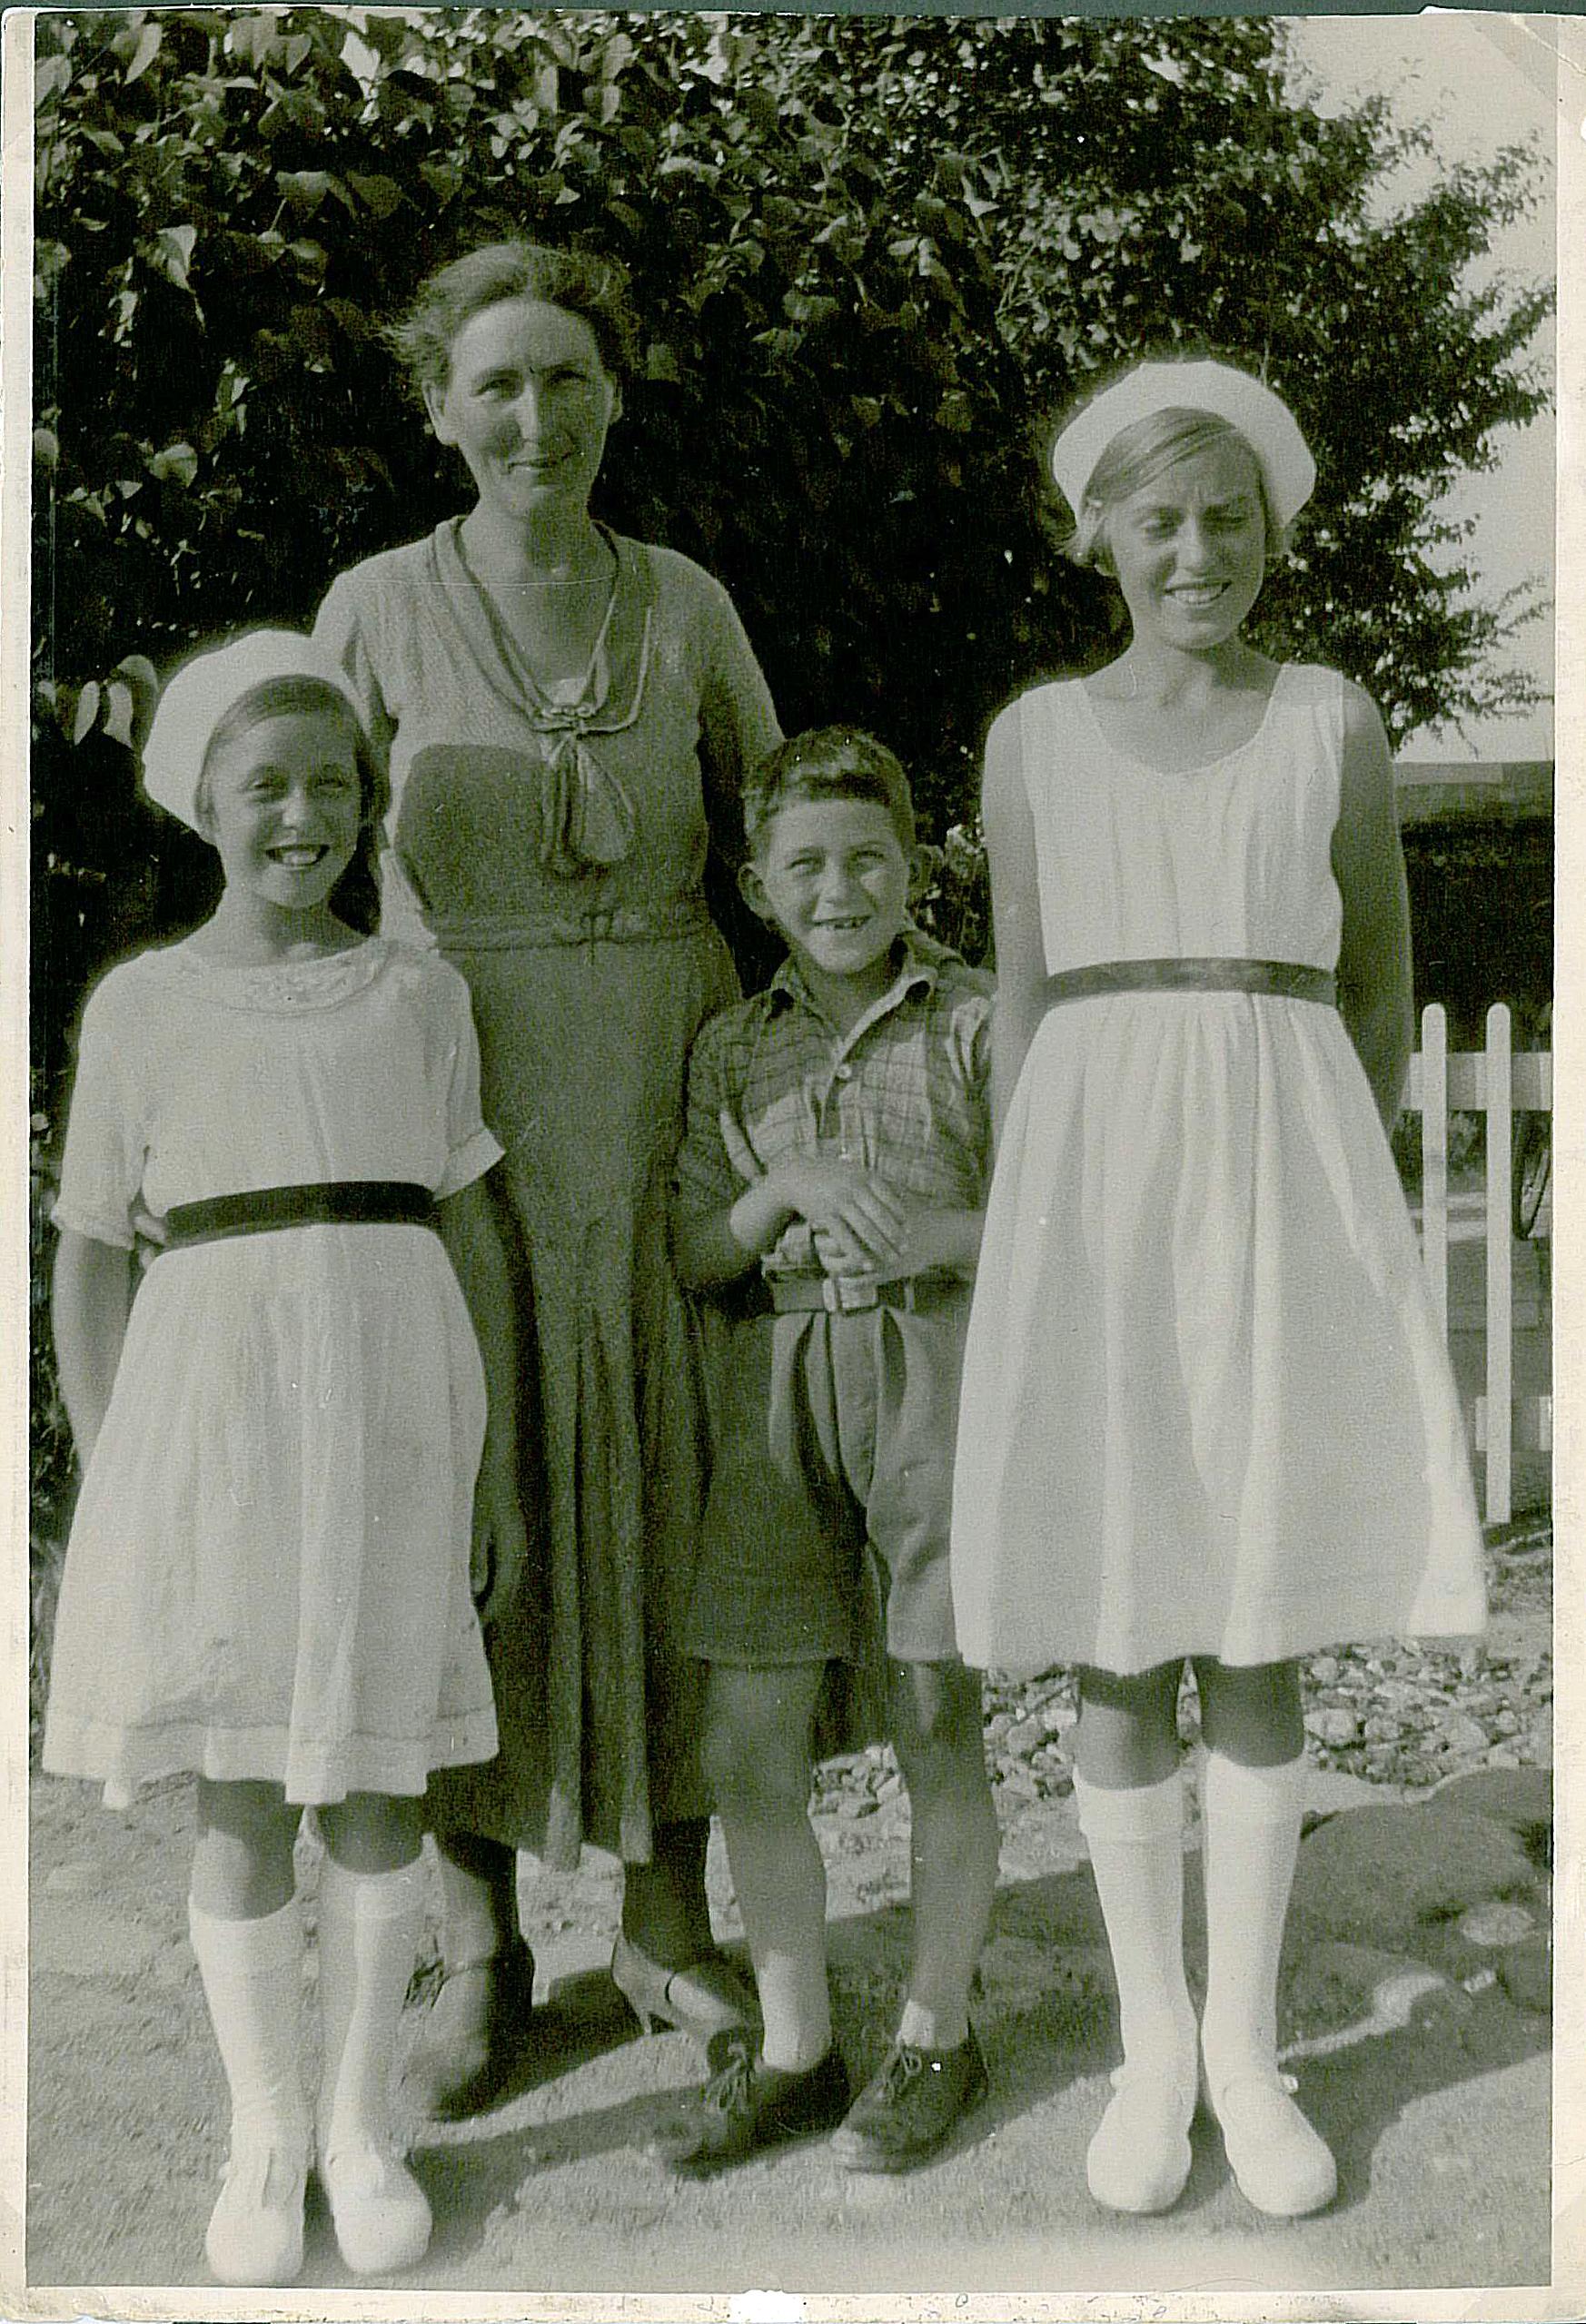 Ruth, Asta, William og Eva foran Mathavej 5 en varm sommerdag